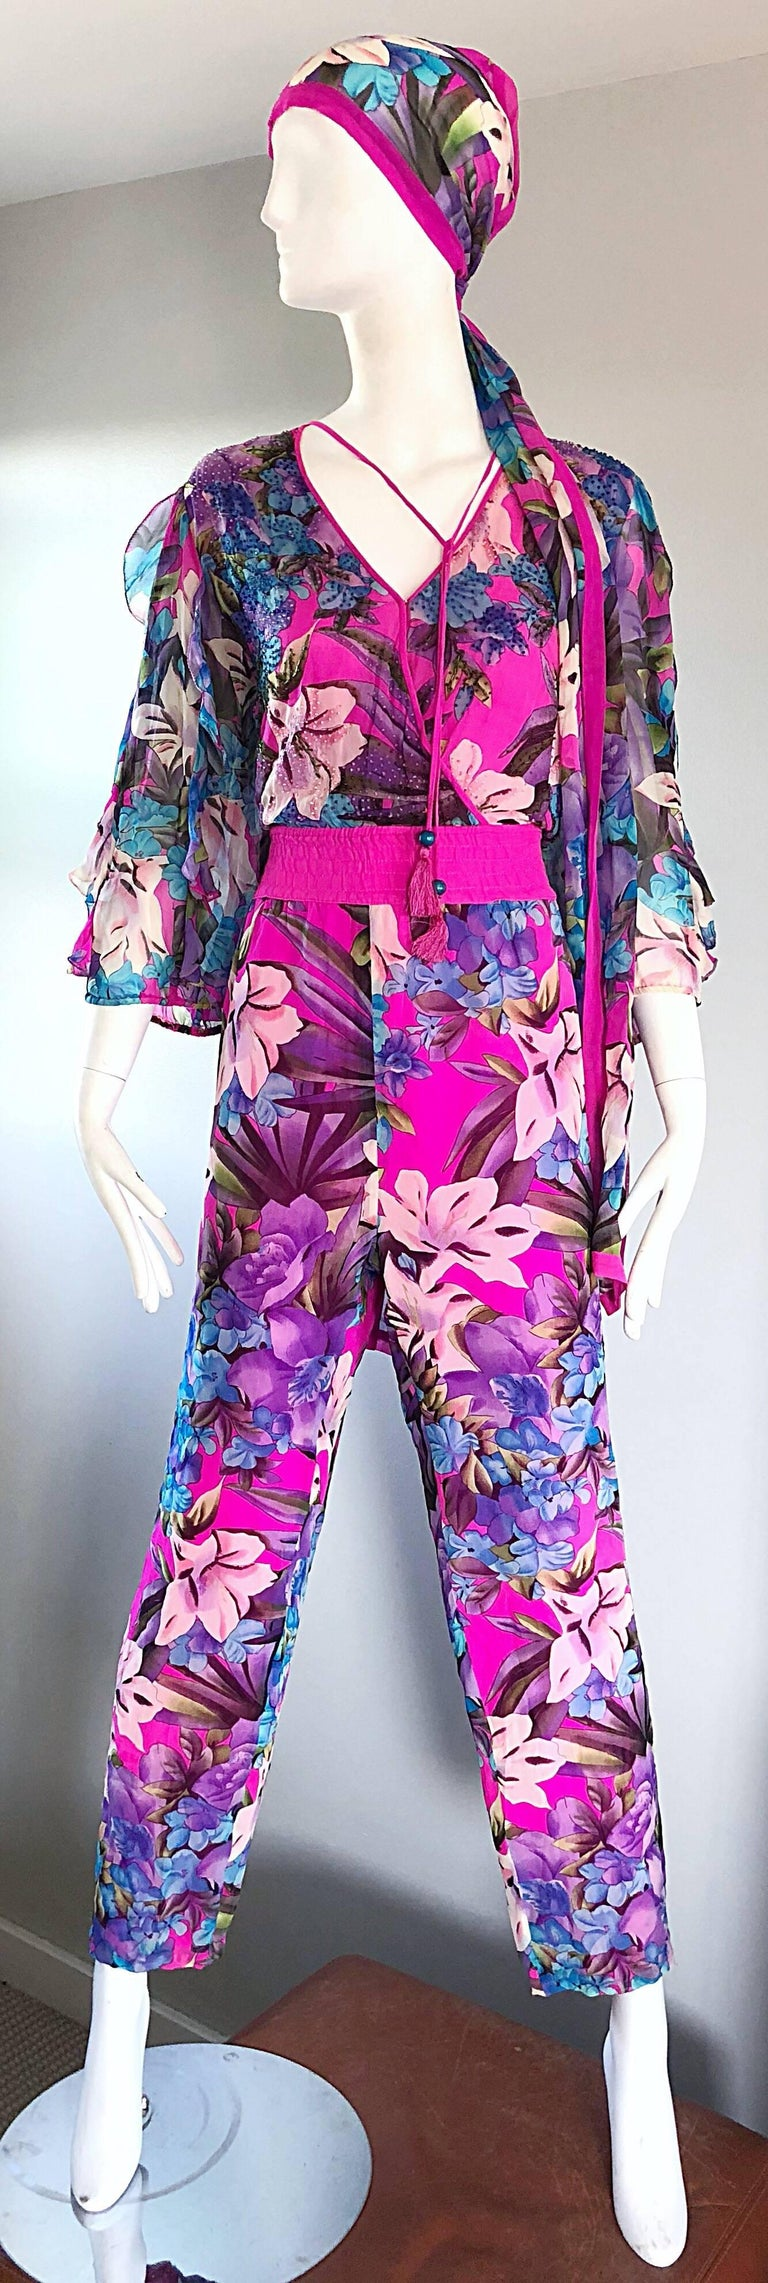 Amazing Vintage Diane Freis Silk Chiffon Beaded Pink Jumpsuit & Head Scarf Sash  For Sale 5